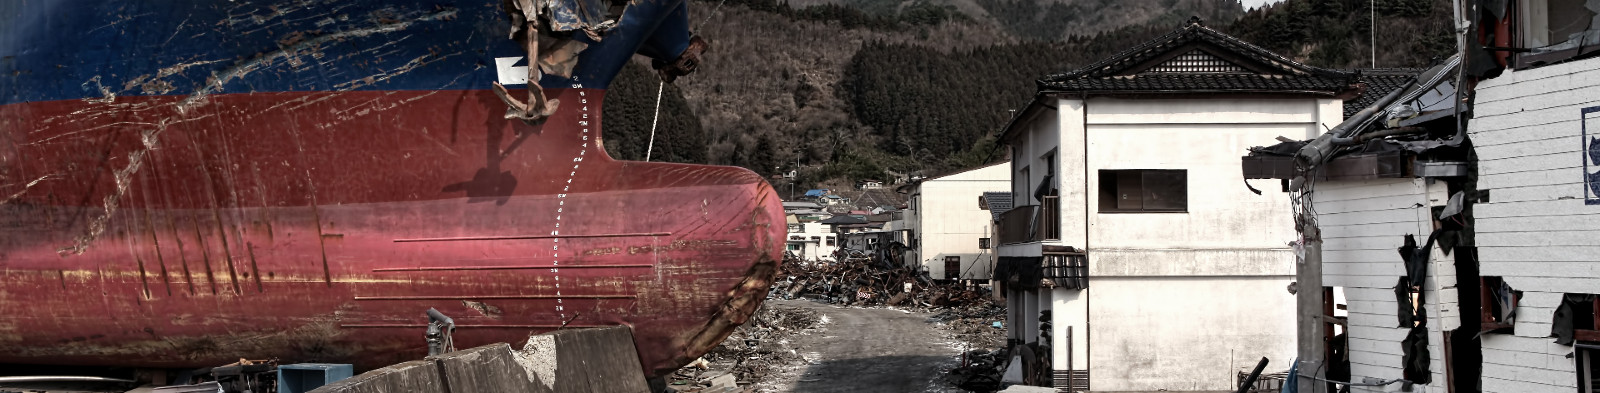 Ship wrecked by Japan tsunami and earthquake